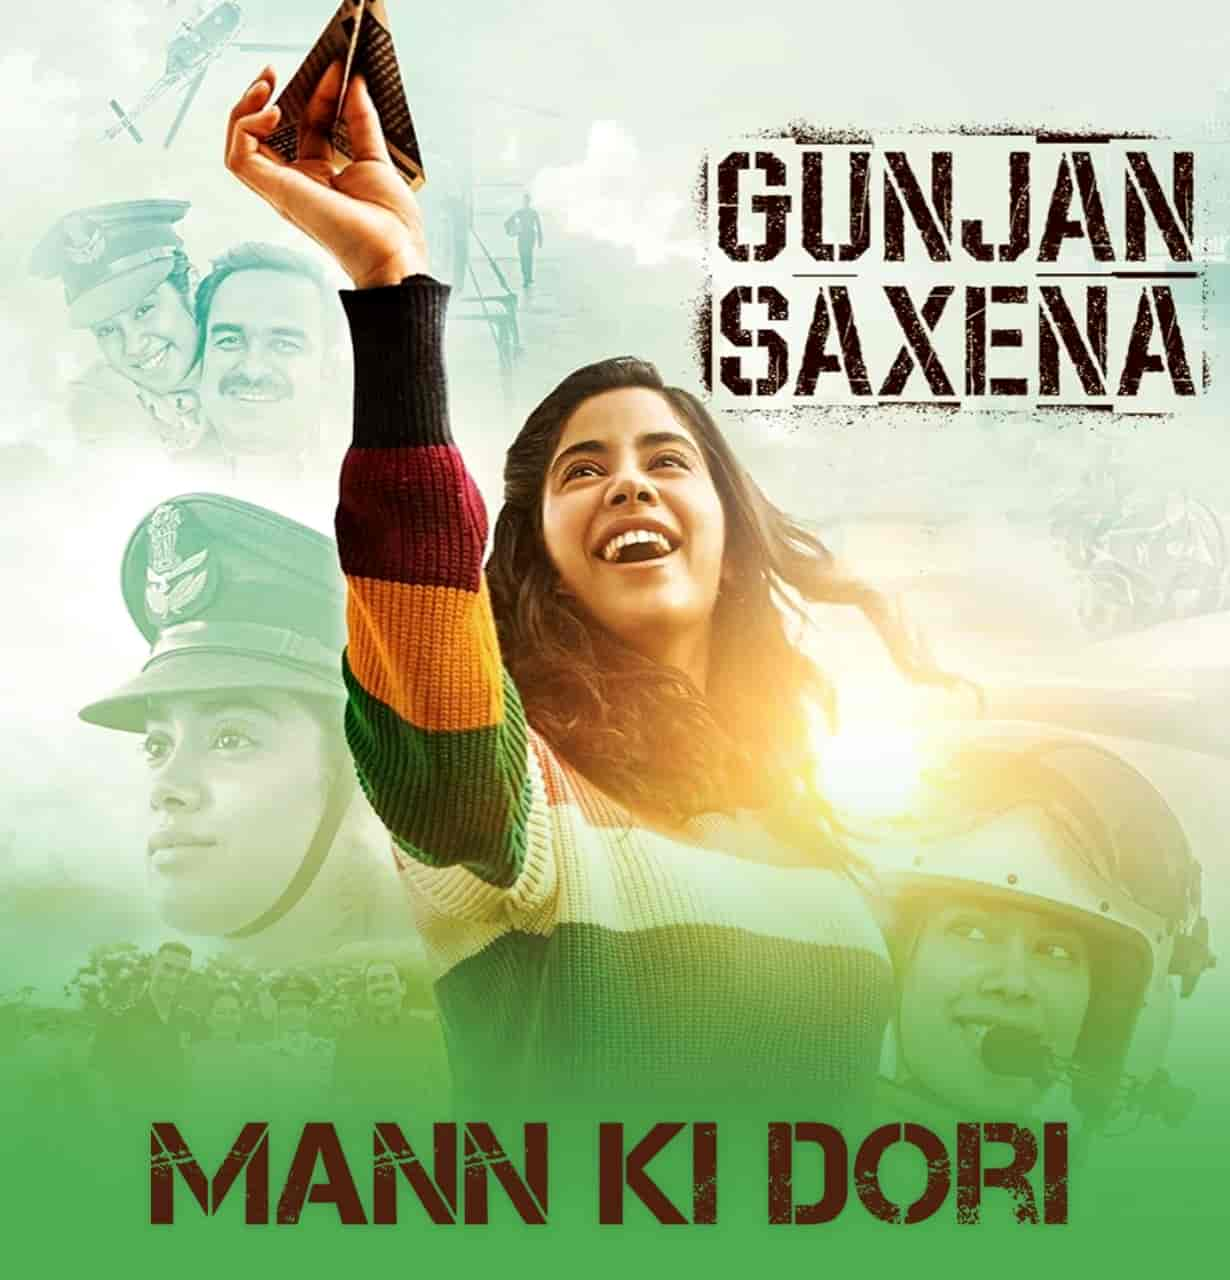 Mann Ki Dori Hindi Song Image From Movie Gunjan Saxena